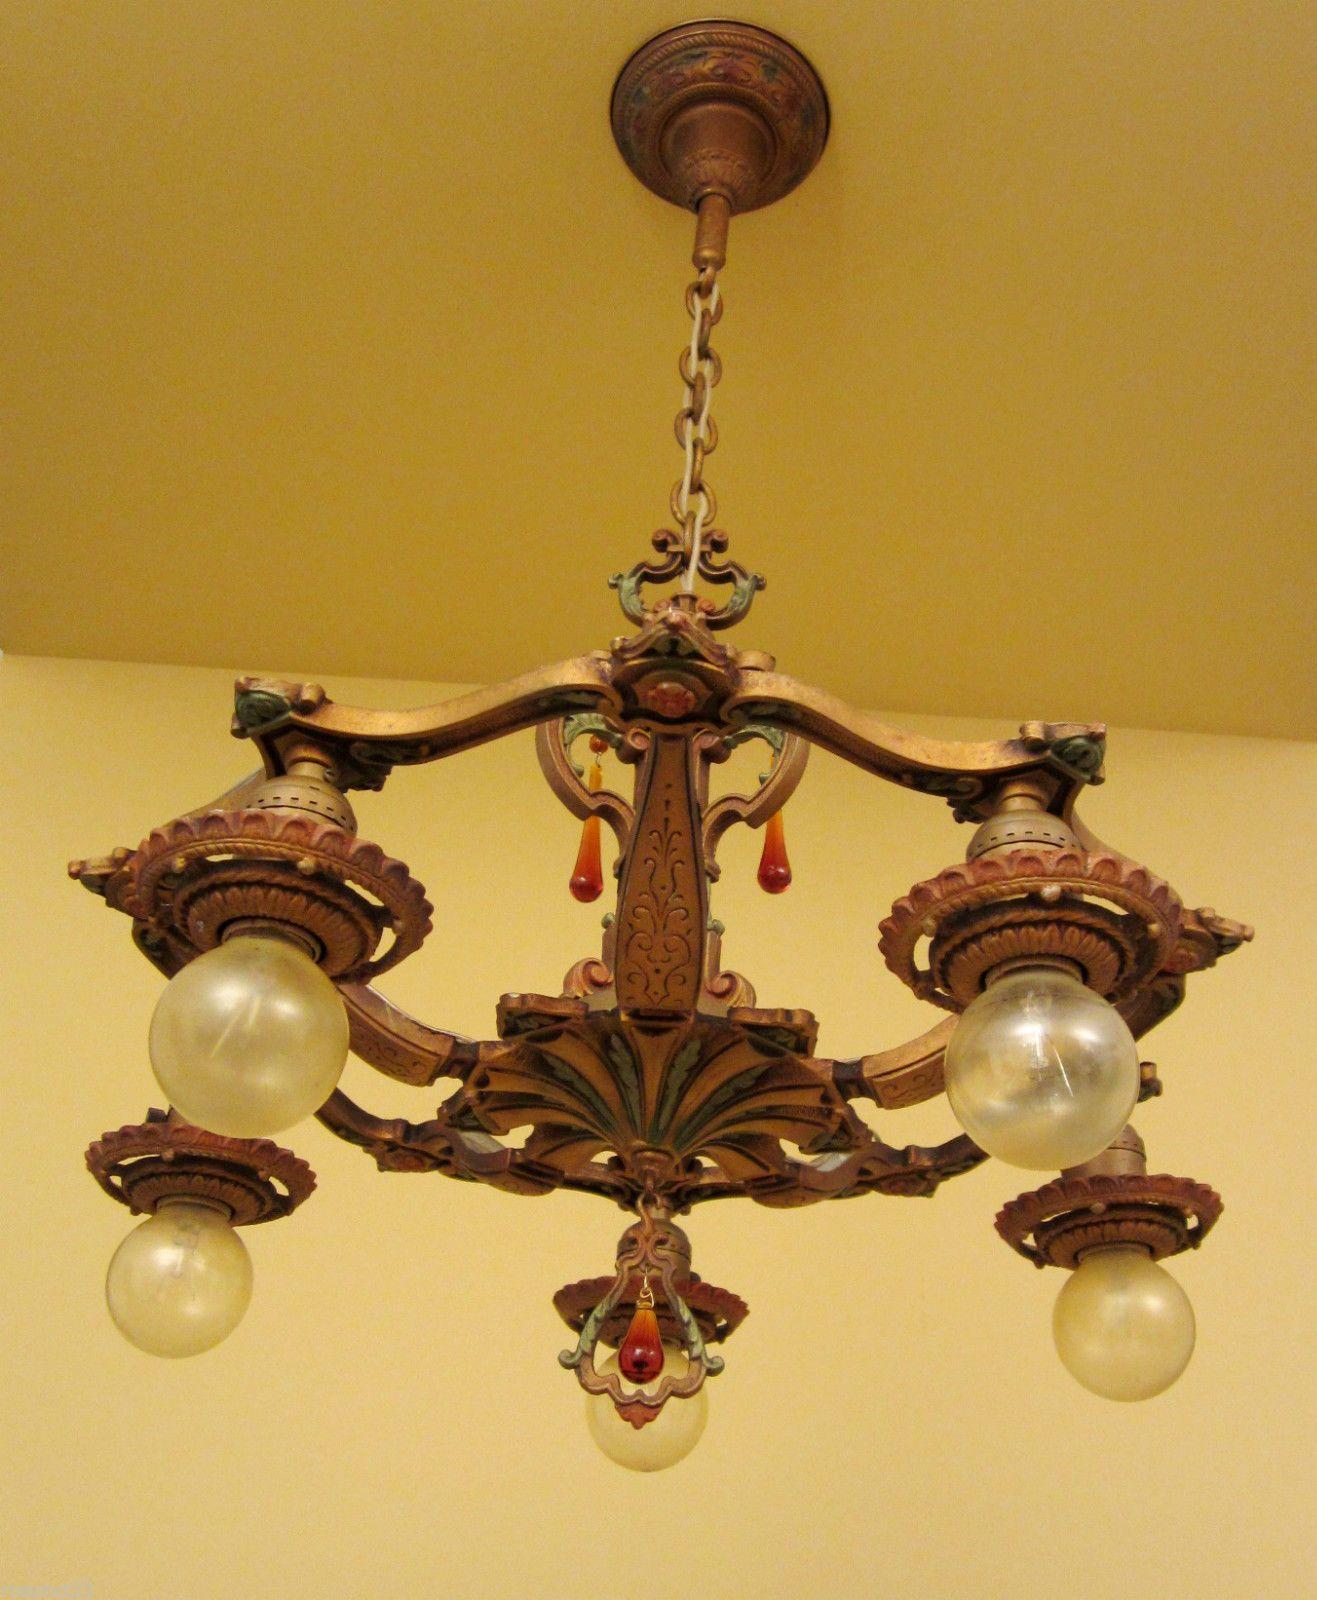 Vintage lighting antique 1920s chandelier luscious original vintage lighting antique 1920s chandelier luscious original polychrome arubaitofo Gallery